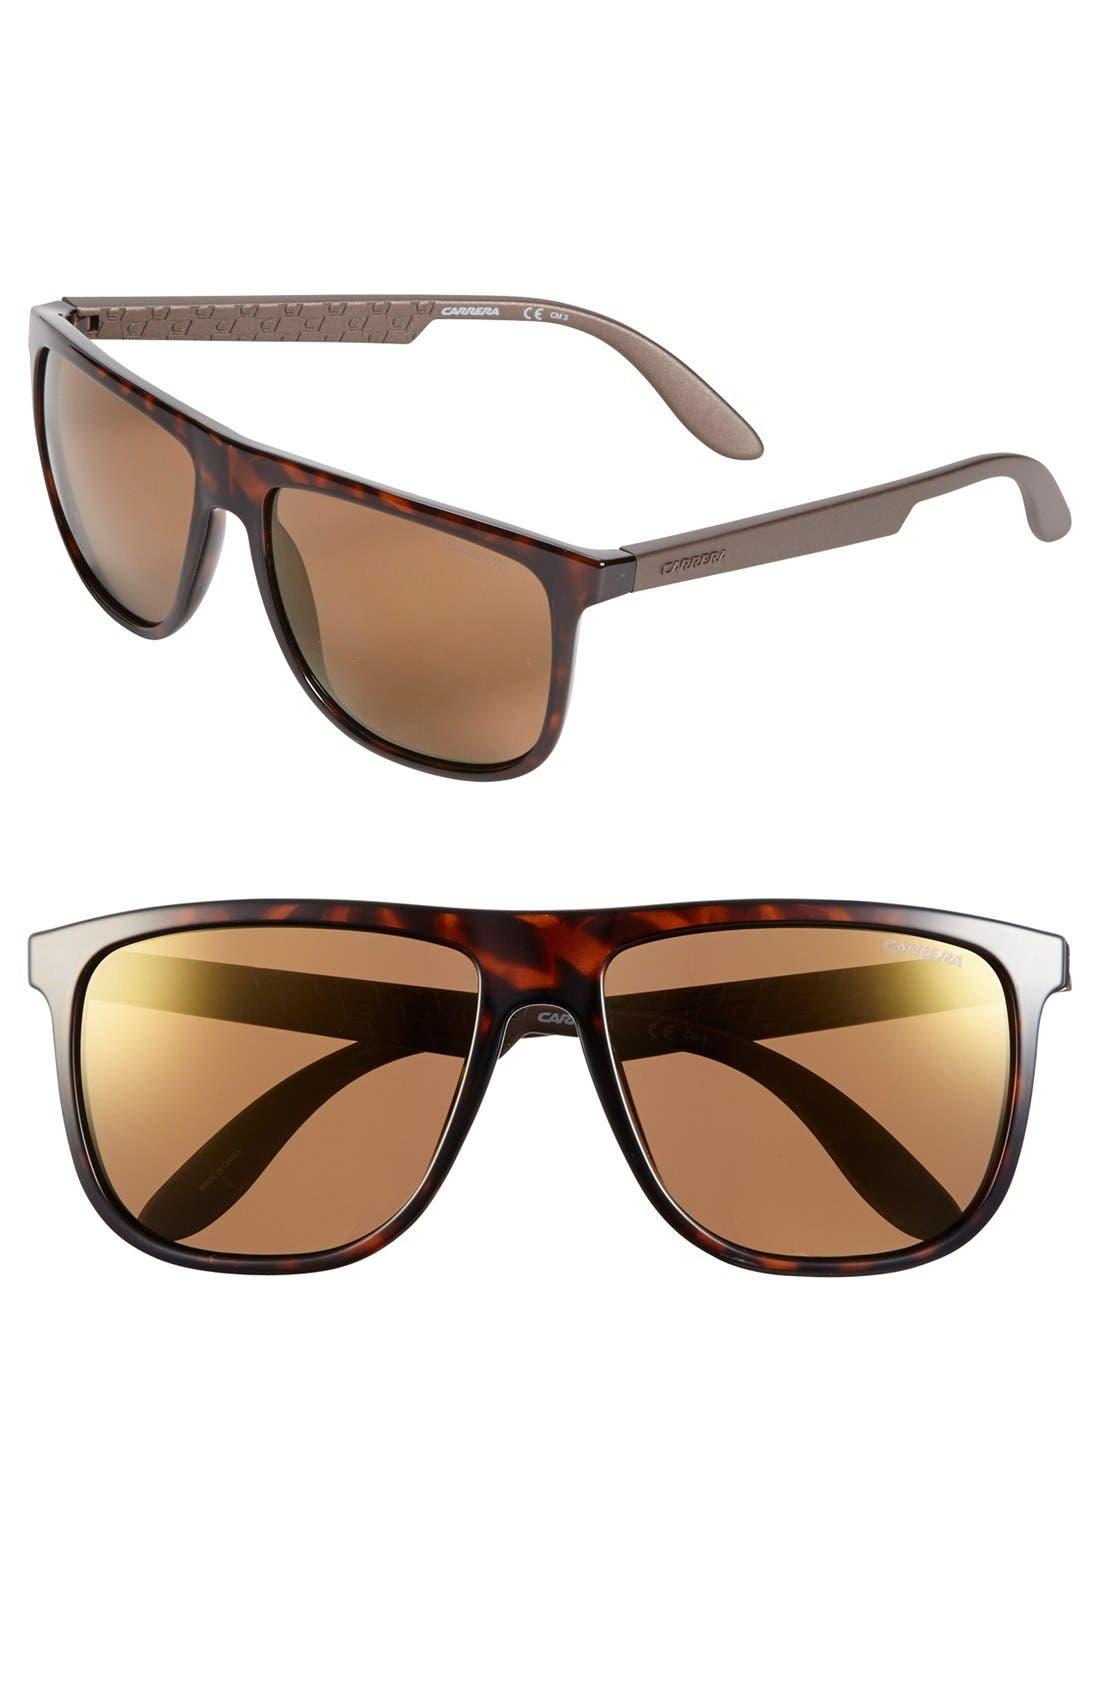 '5003' Sunglasses,                             Main thumbnail 1, color,                             HAVANA